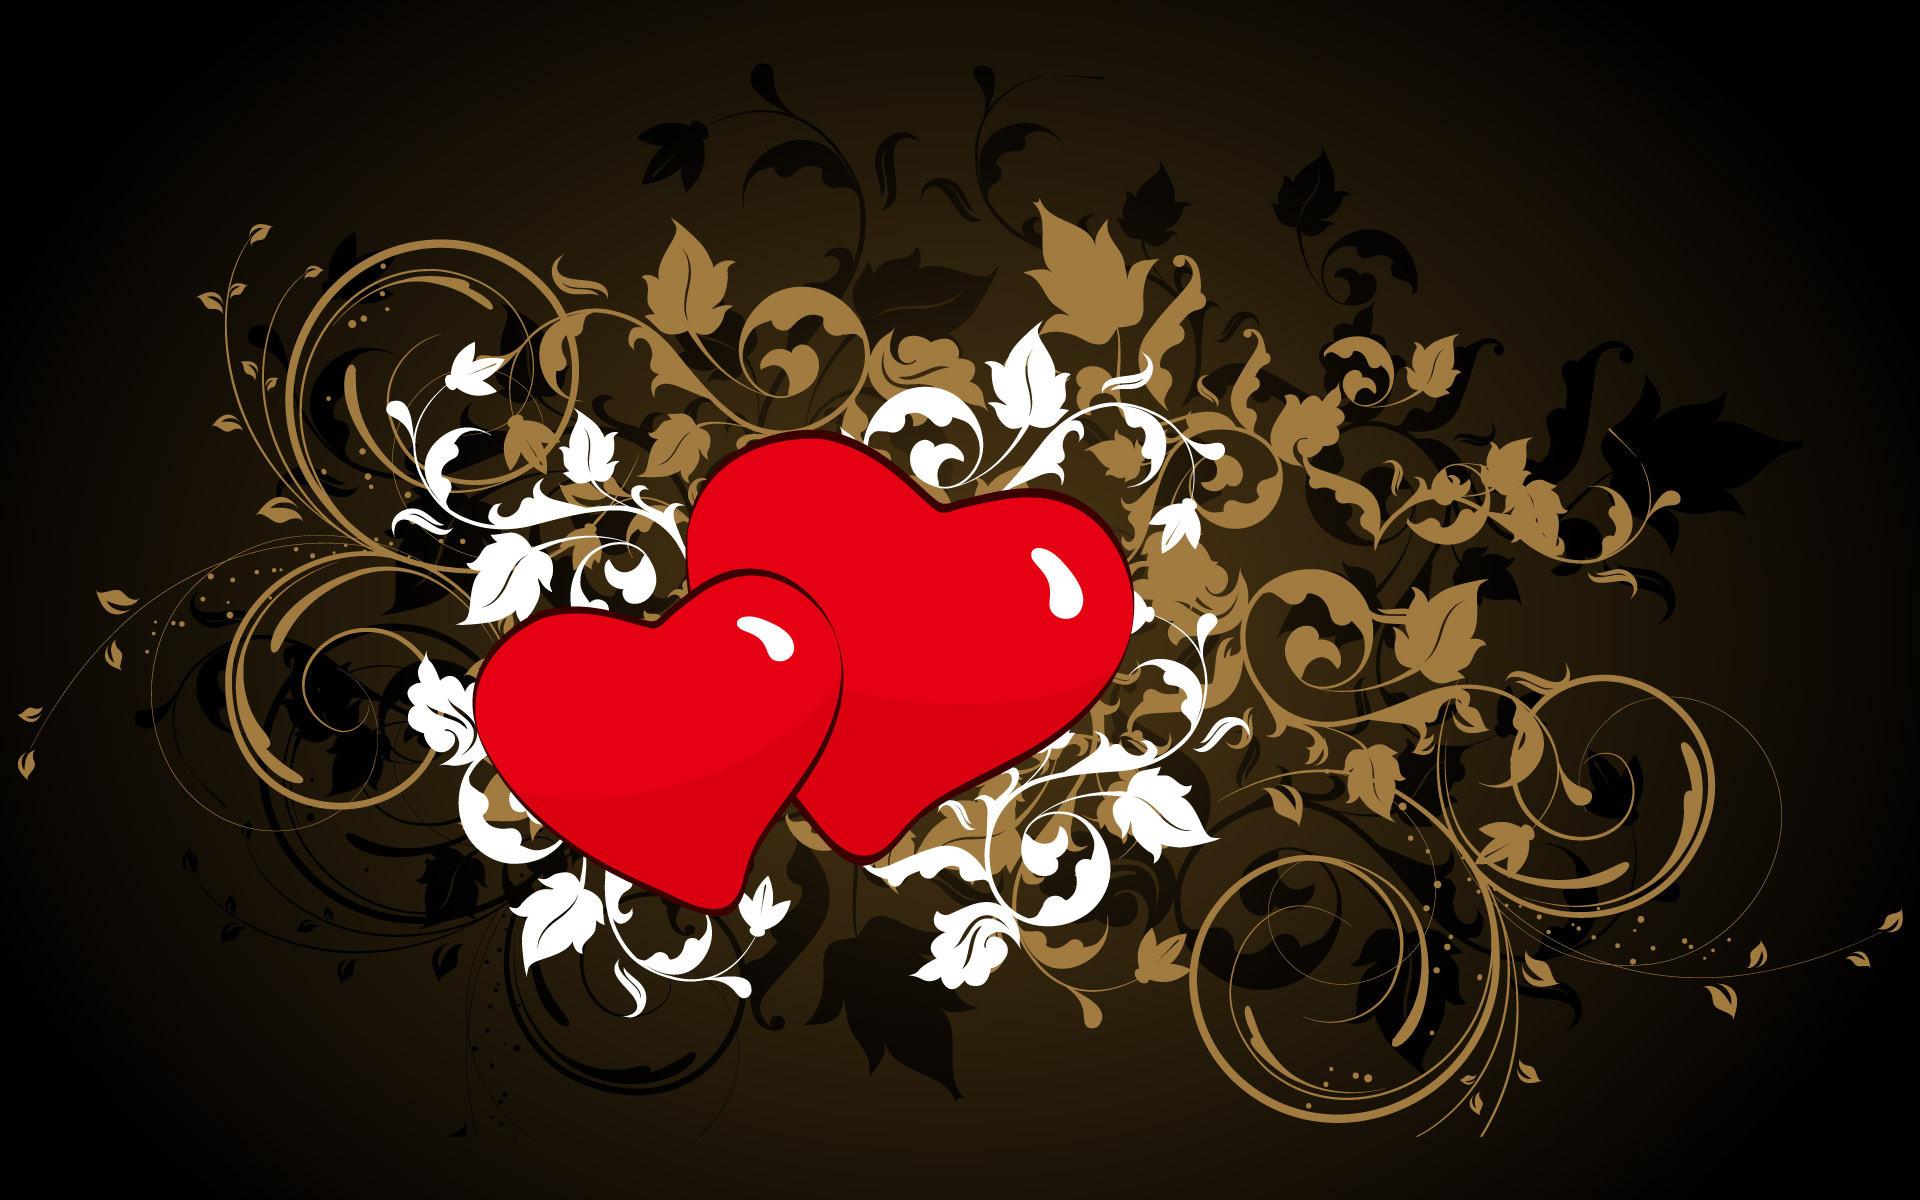 Heart Love HD Black Background